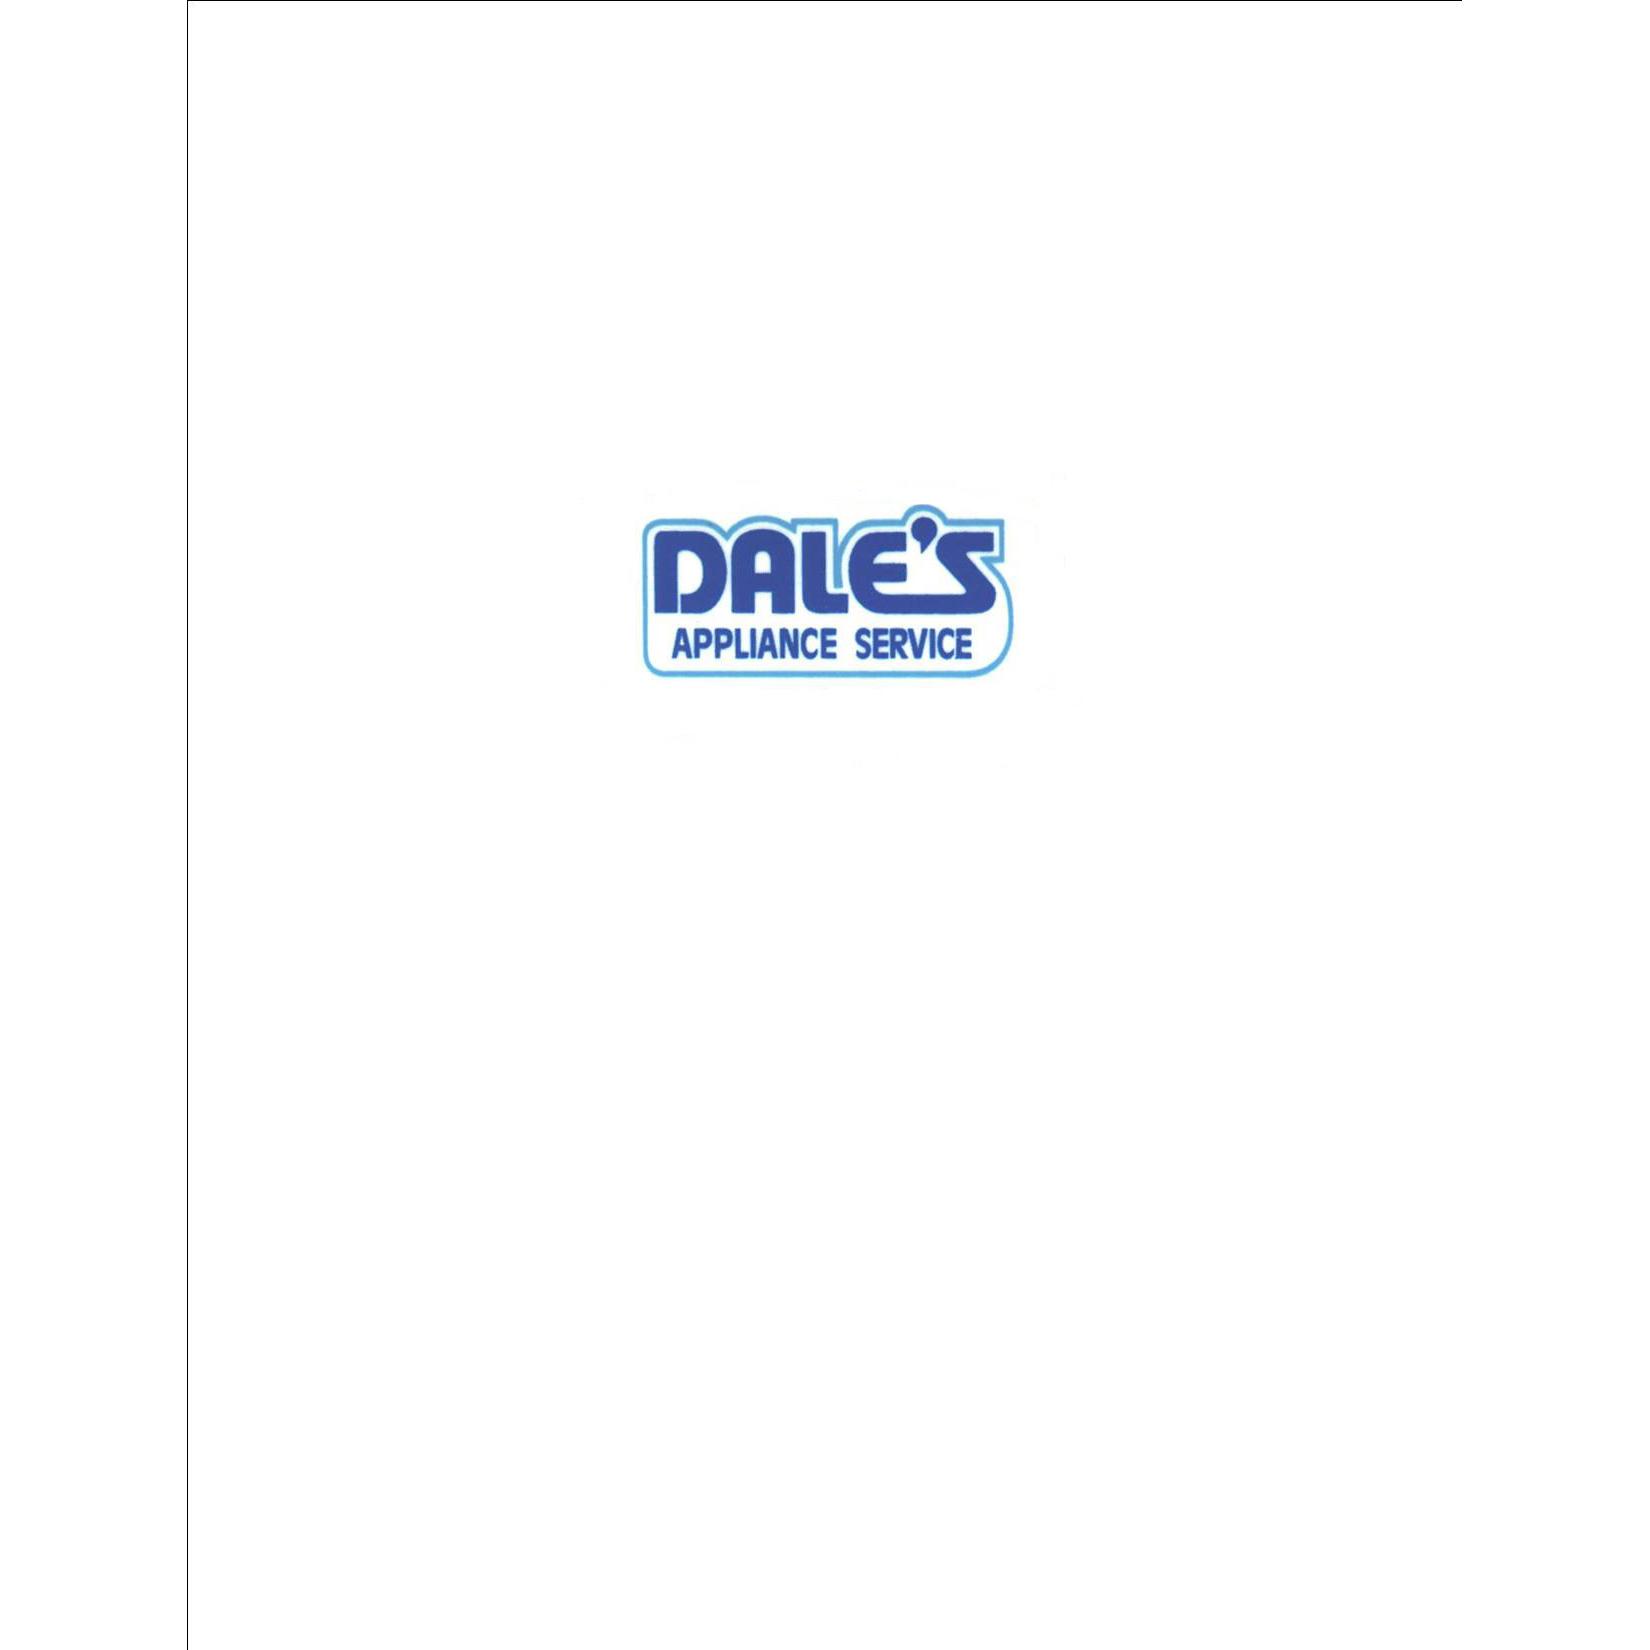 Dale's Appliance Service - Newfield, NJ - Appliance Rental & Repair Services